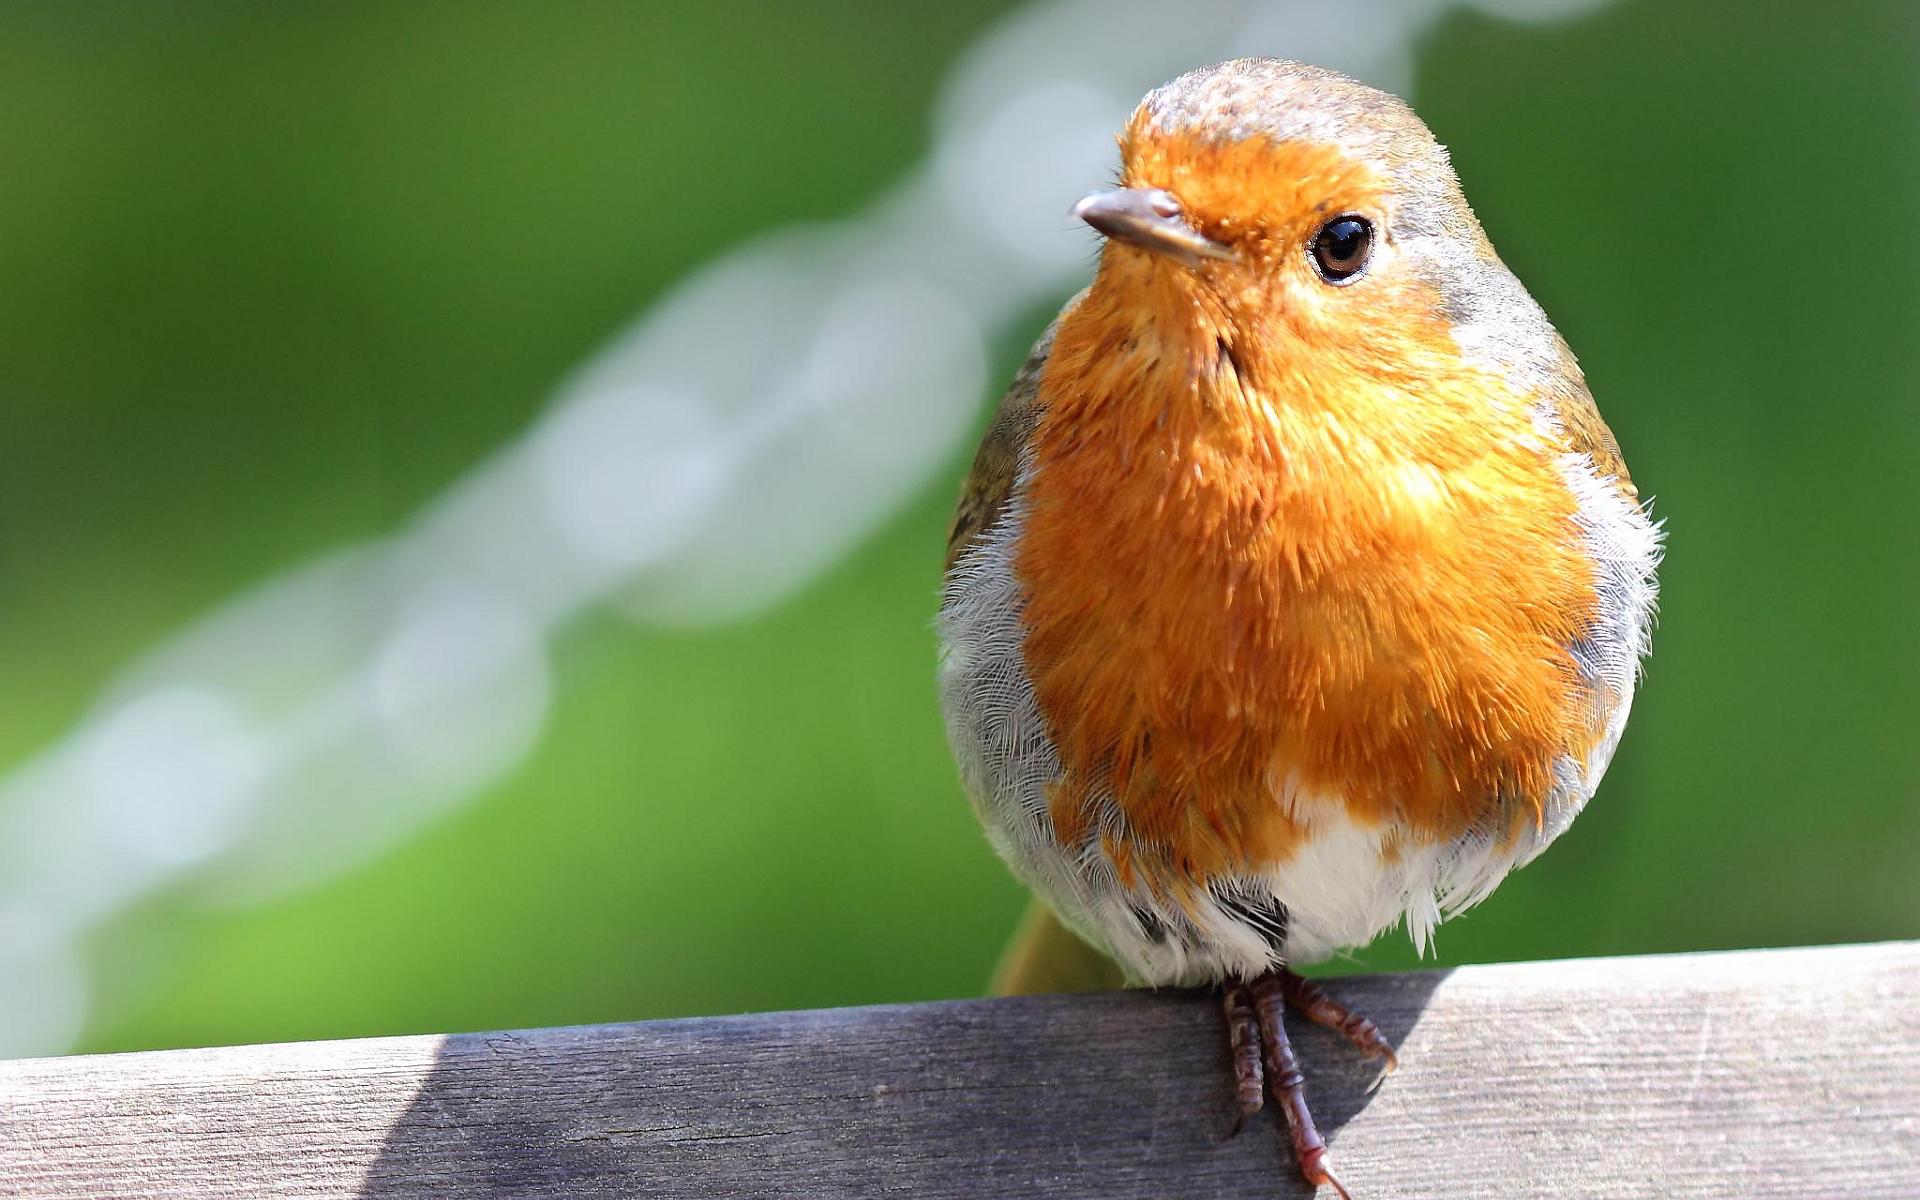 Robin bird close up